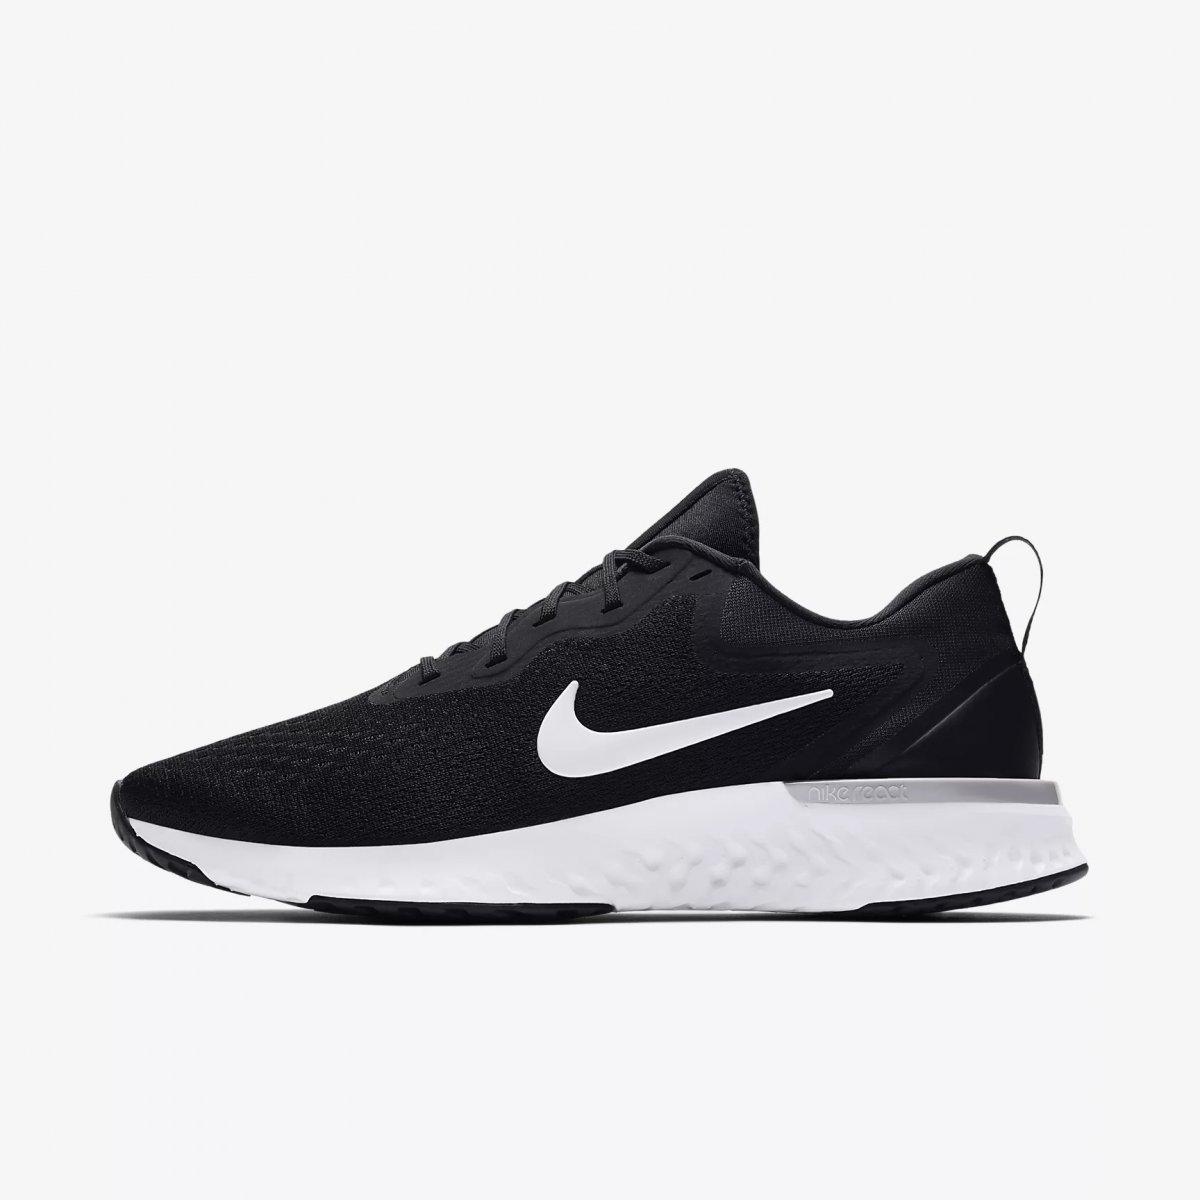 f5f88a10f6e Tênis Nike Odyssey React Masculino 0887230995REACT Nike - PT ...